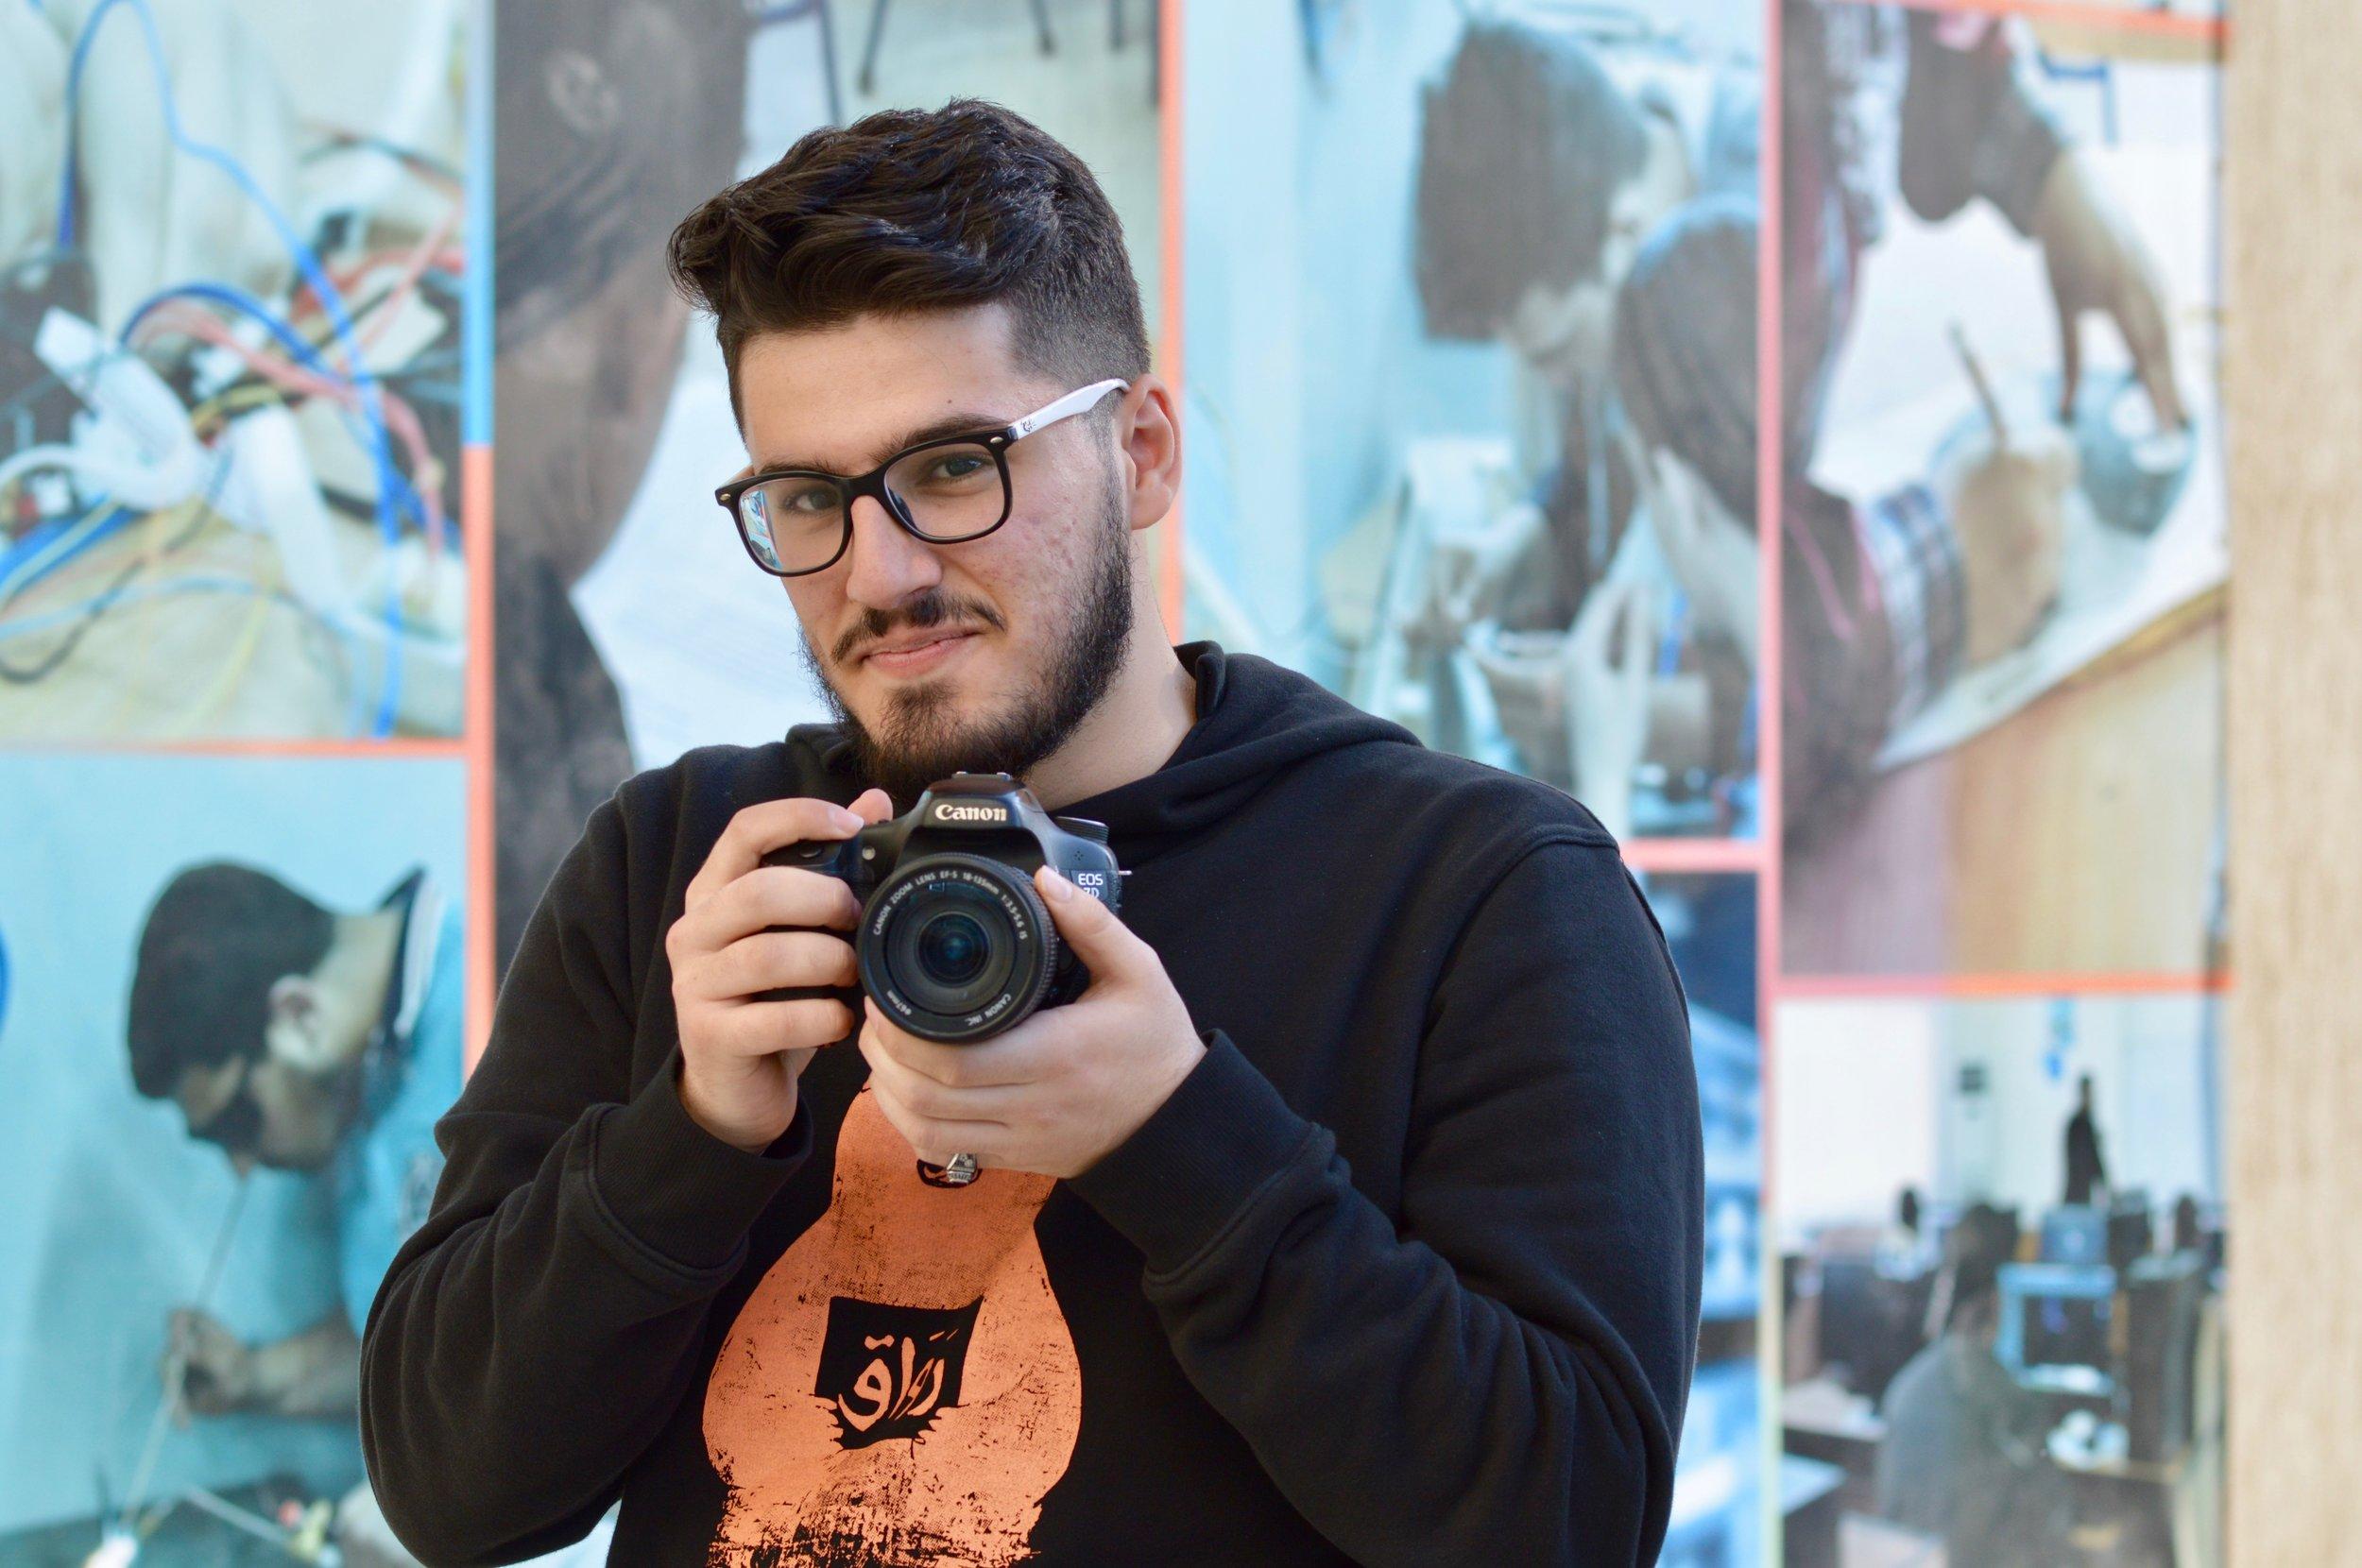 Palestinian Teenager Using YouTube to Transcend His Refugee Status - Medium